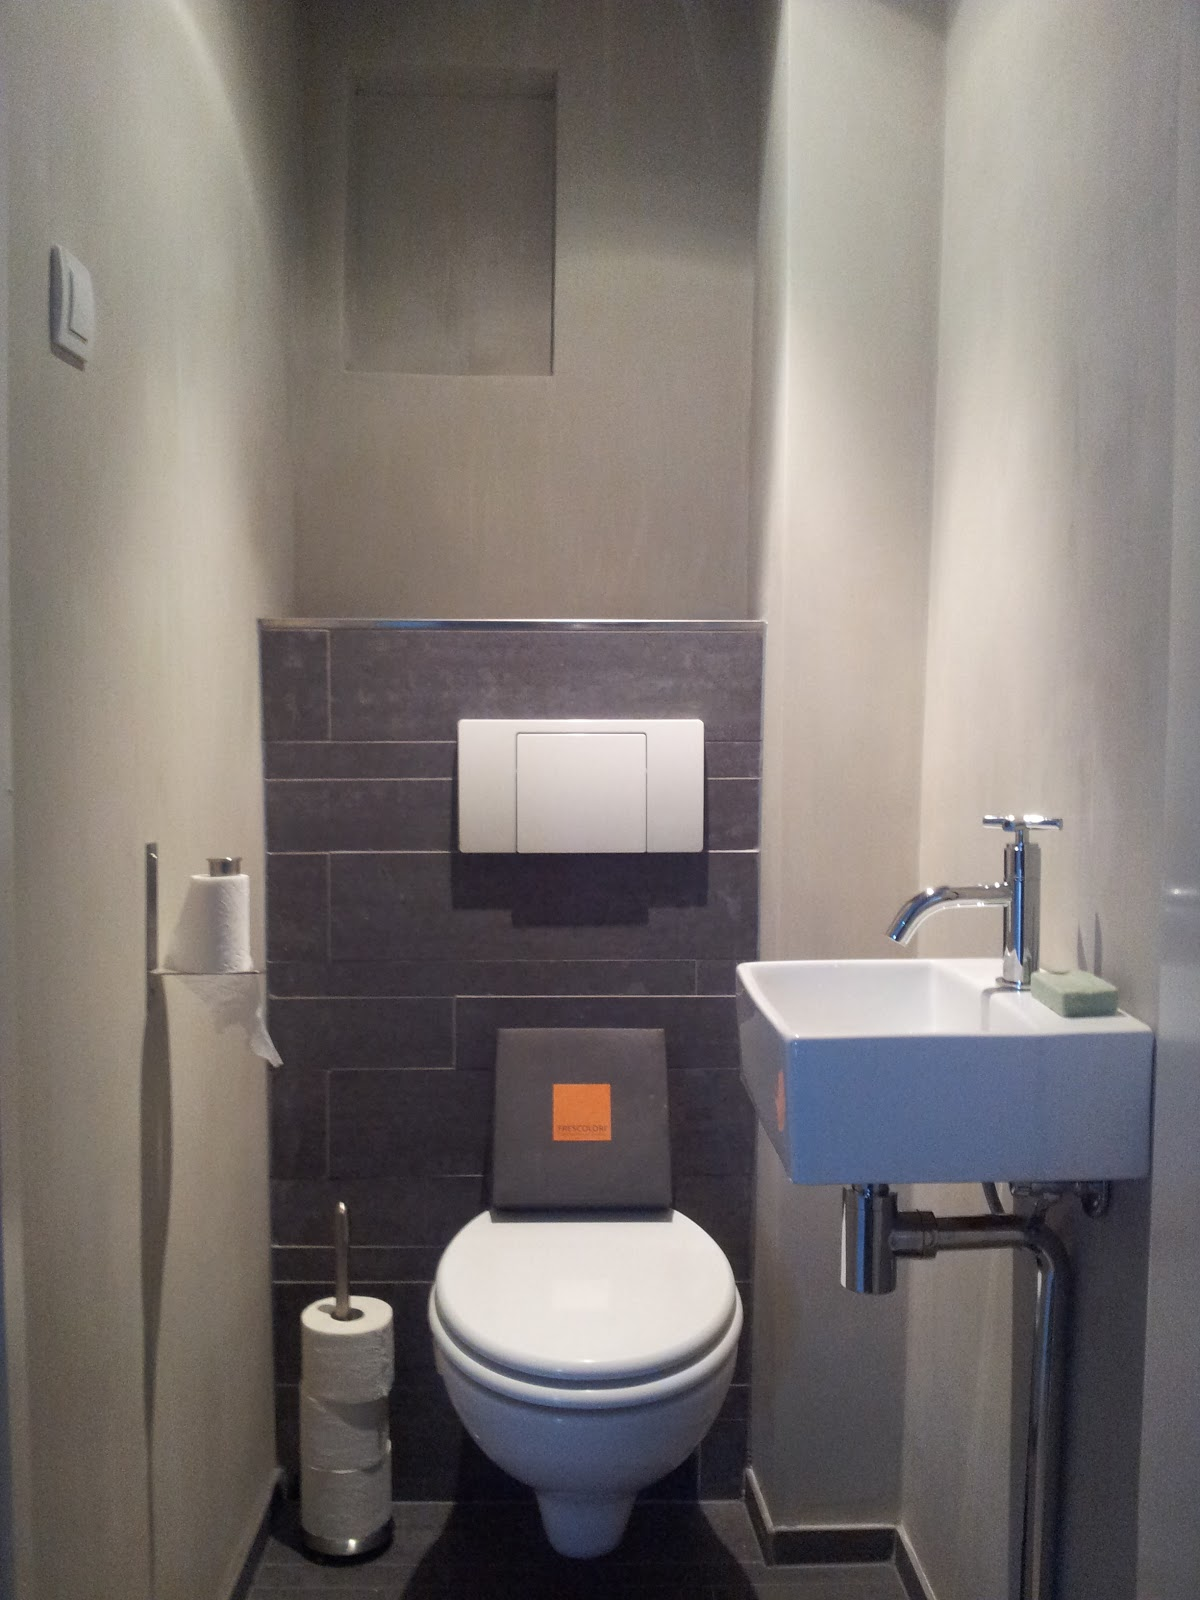 Betonlook Frescolori 174 Kalkverf Toilet Porcelano Tegels